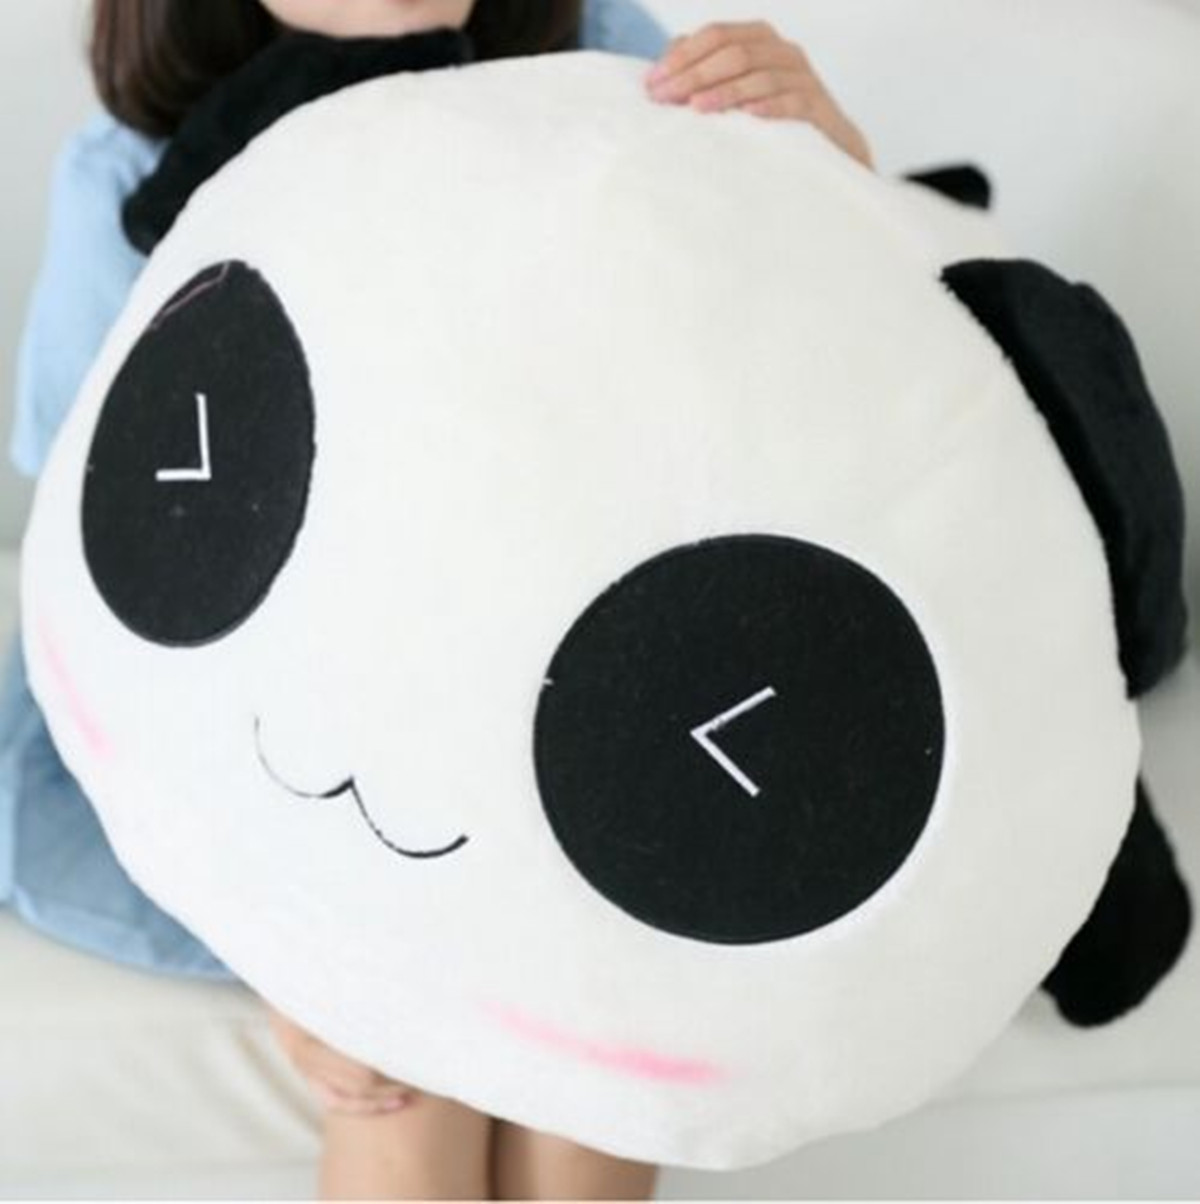 Stuffed Plush Doll Toy Animal Cute Panda Pillow Bolster Gift 25/35/45/55/70cm eBay